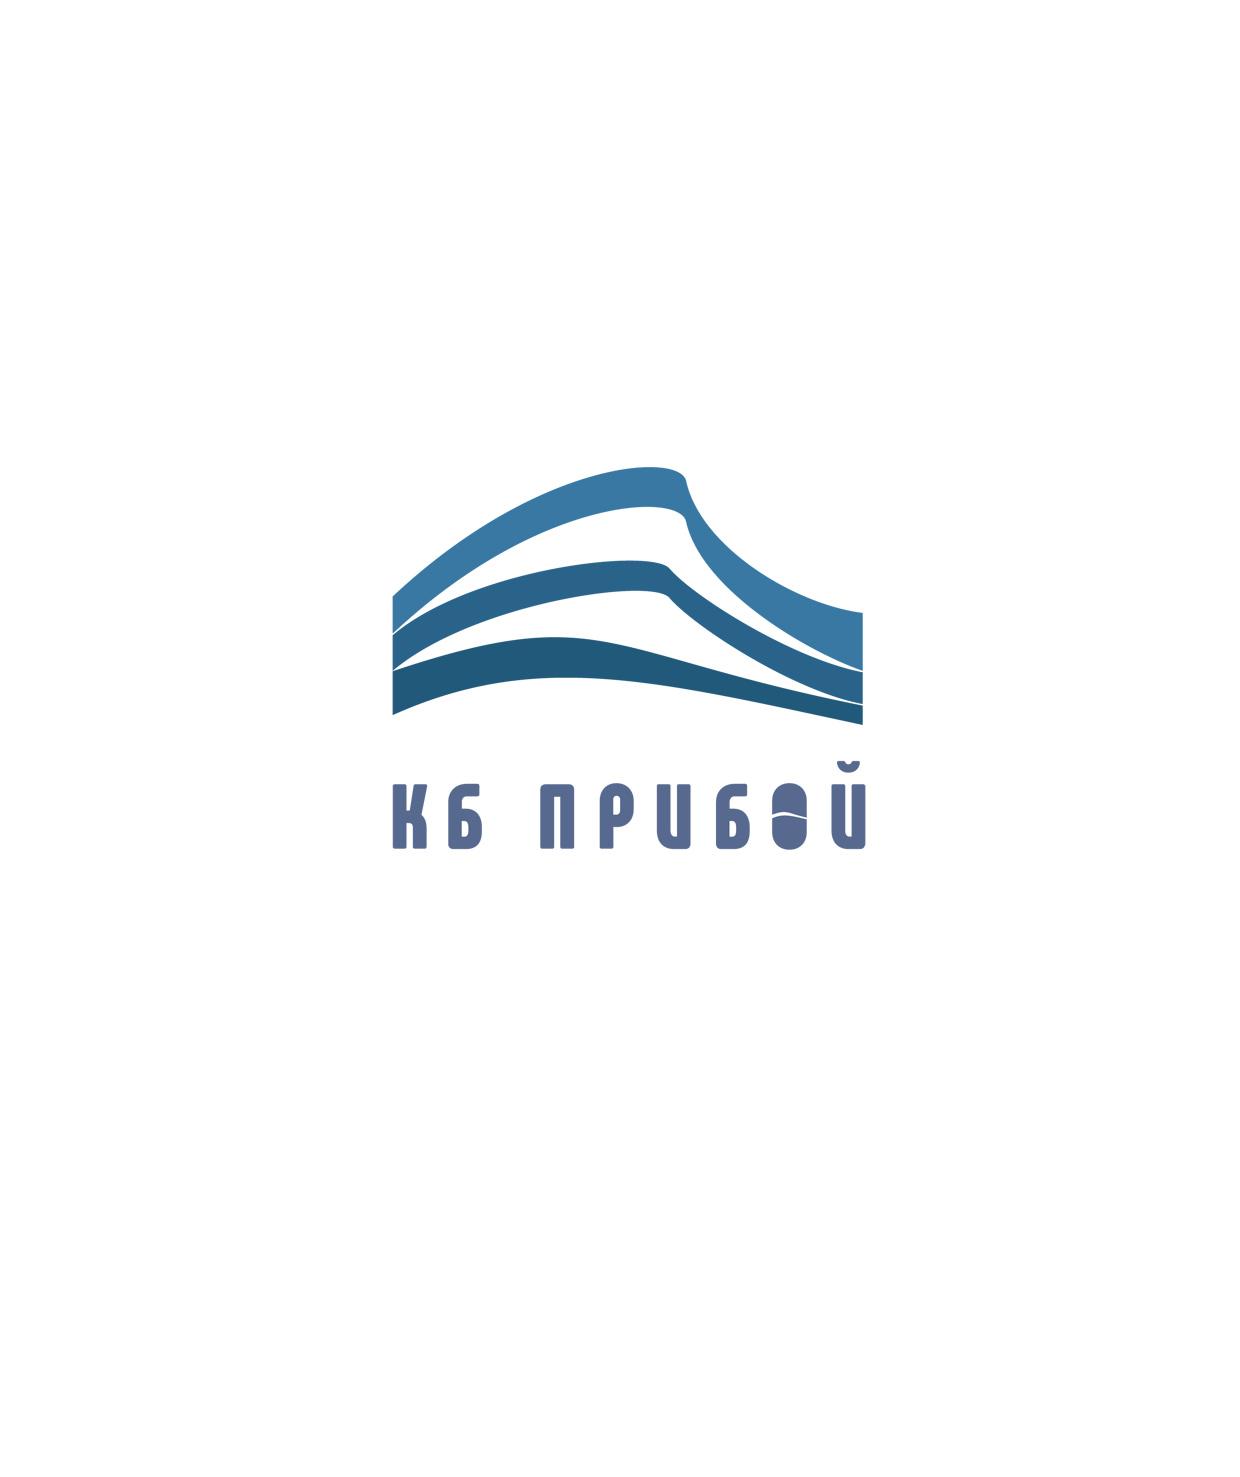 Разработка логотипа и фирменного стиля для КБ Прибой фото f_7085b2bd31013ec8.jpg